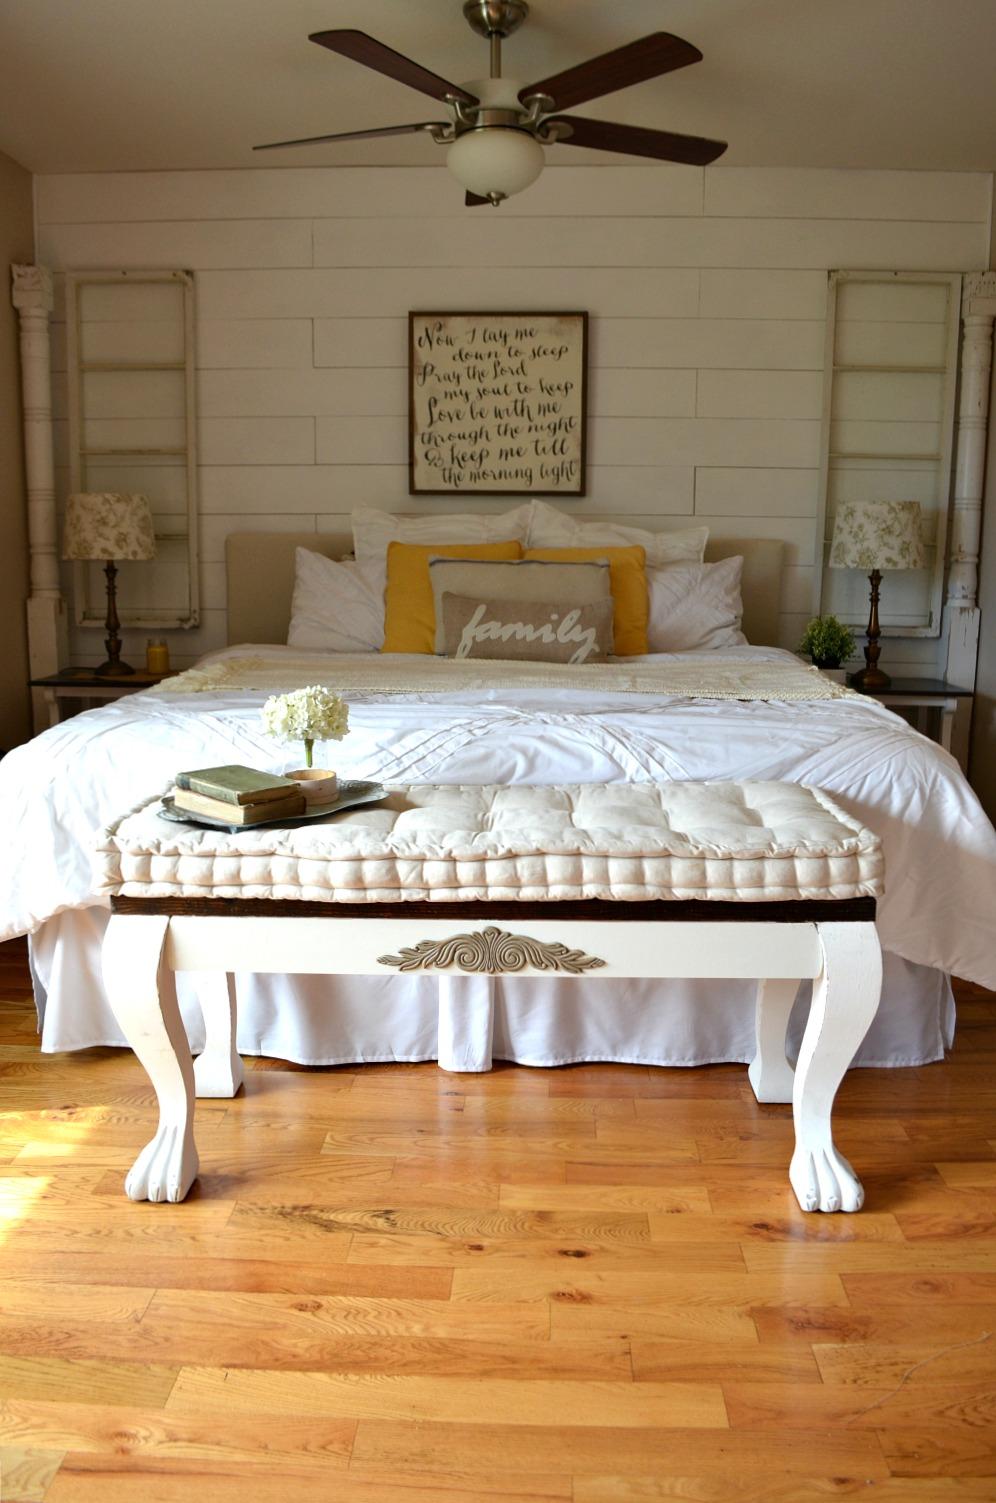 DIY Vintage Bedroom Bench 1 - Sarah Joy Blog